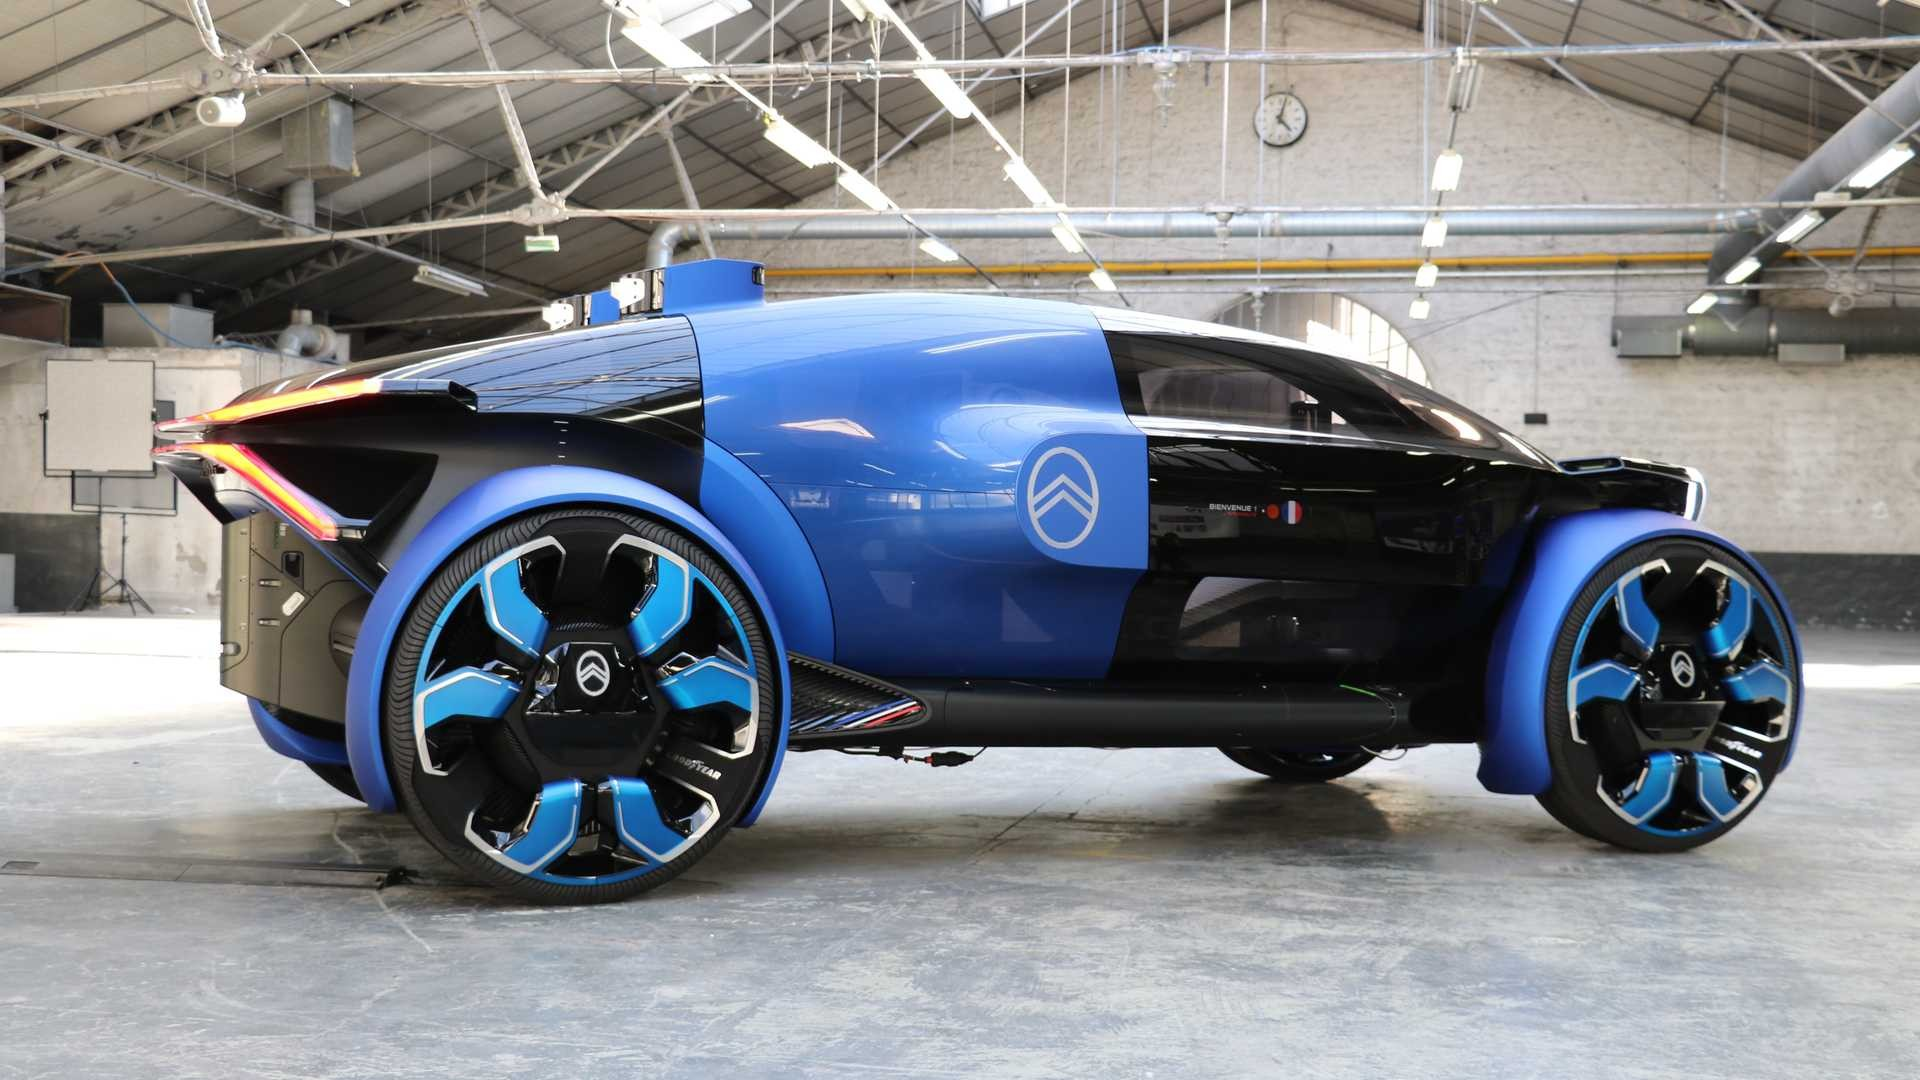 مدل مفهوهی19-19 ؛ خودروی جدید و لوکس سیتروئن + عکس